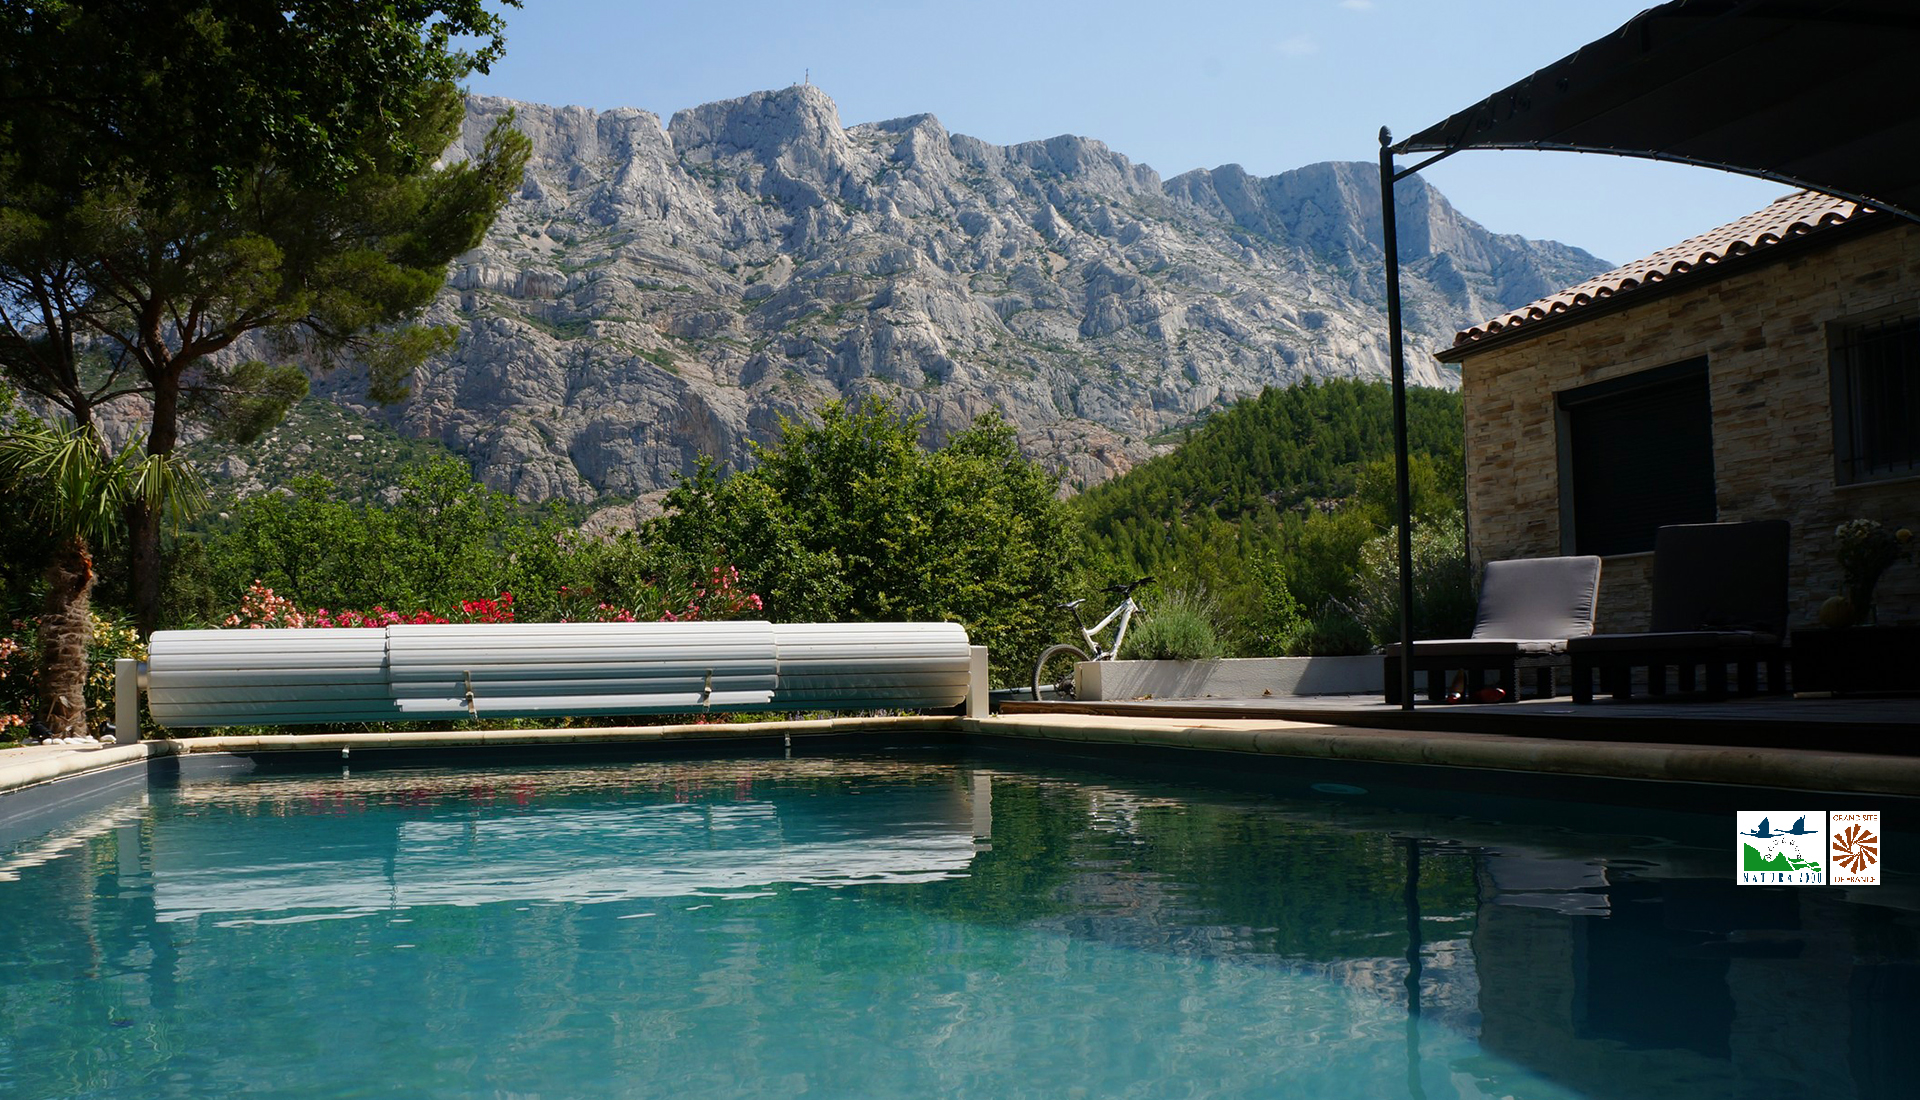 Vue piscine et Sainte-Victoire